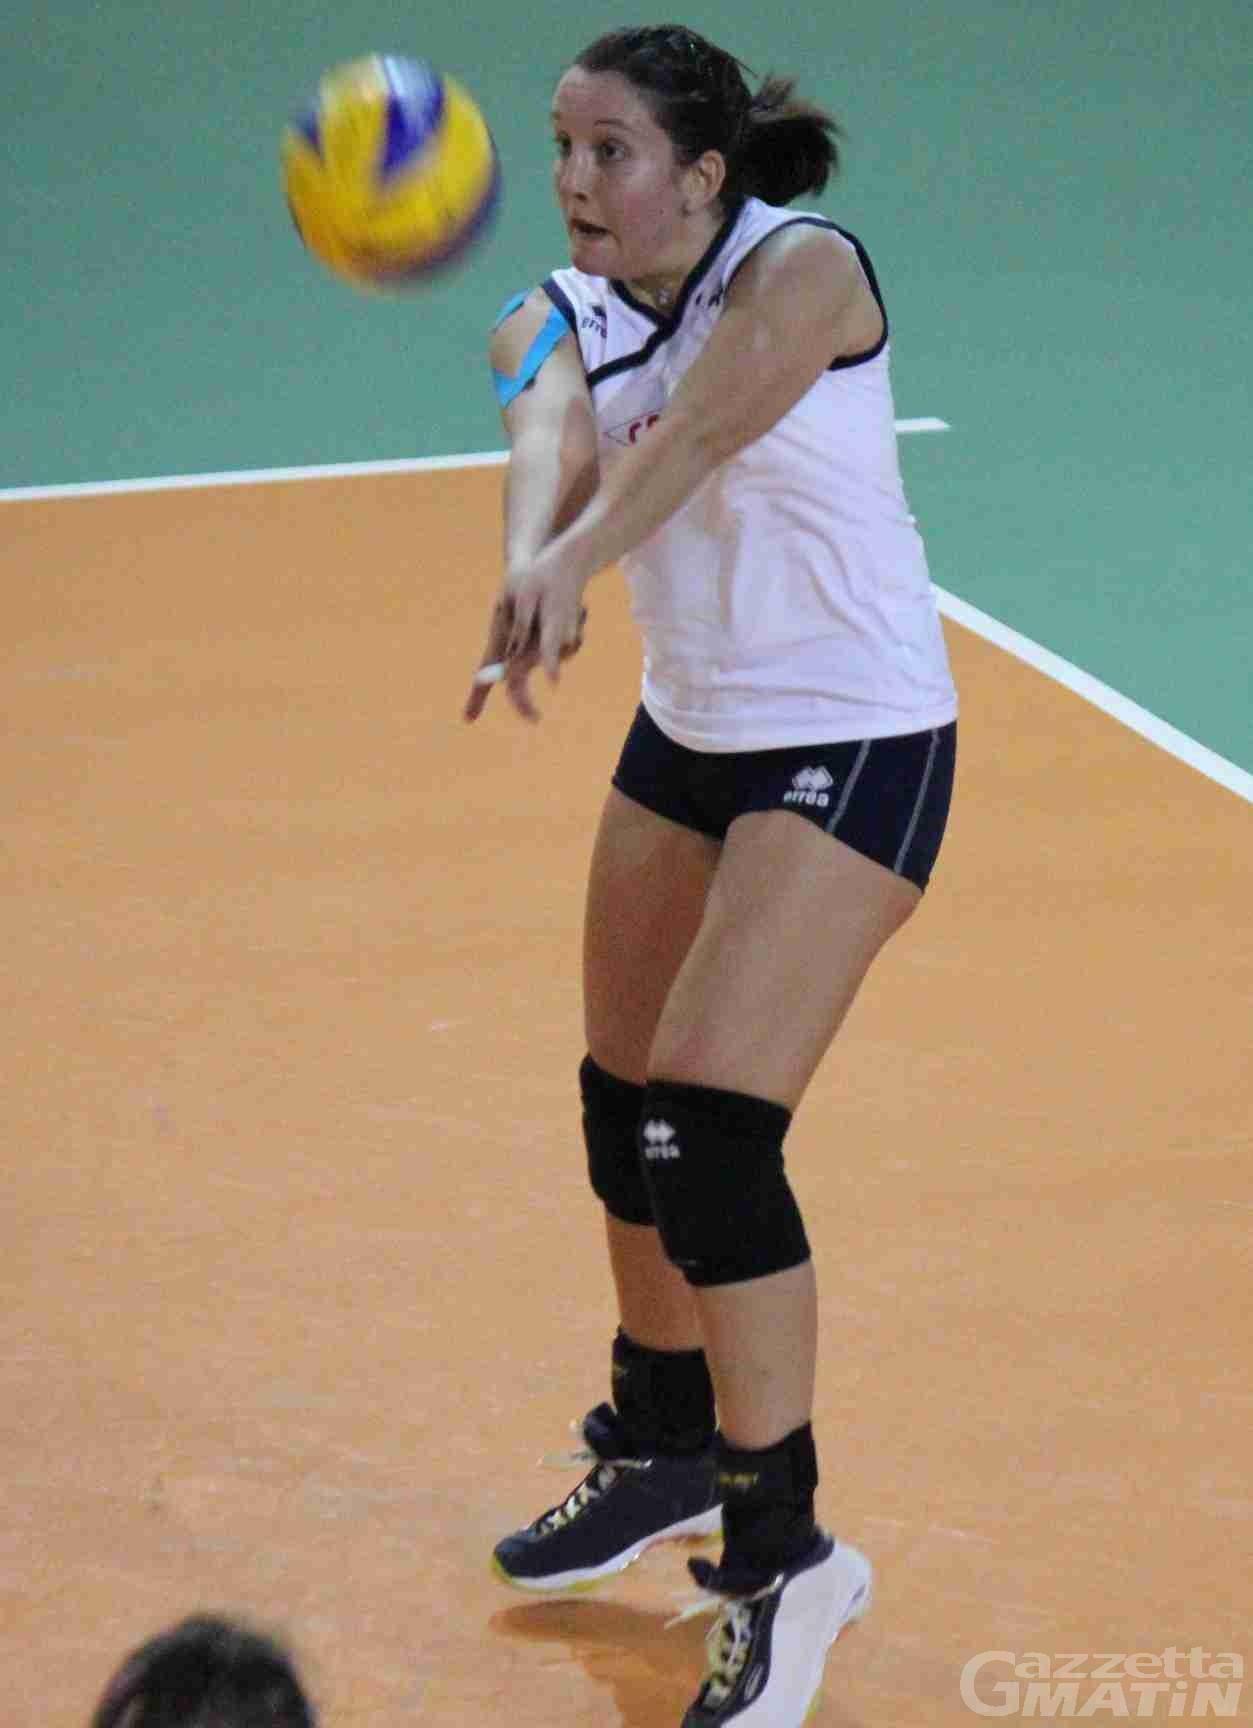 Volley: torna a vince la Cogne Acciai Speciali